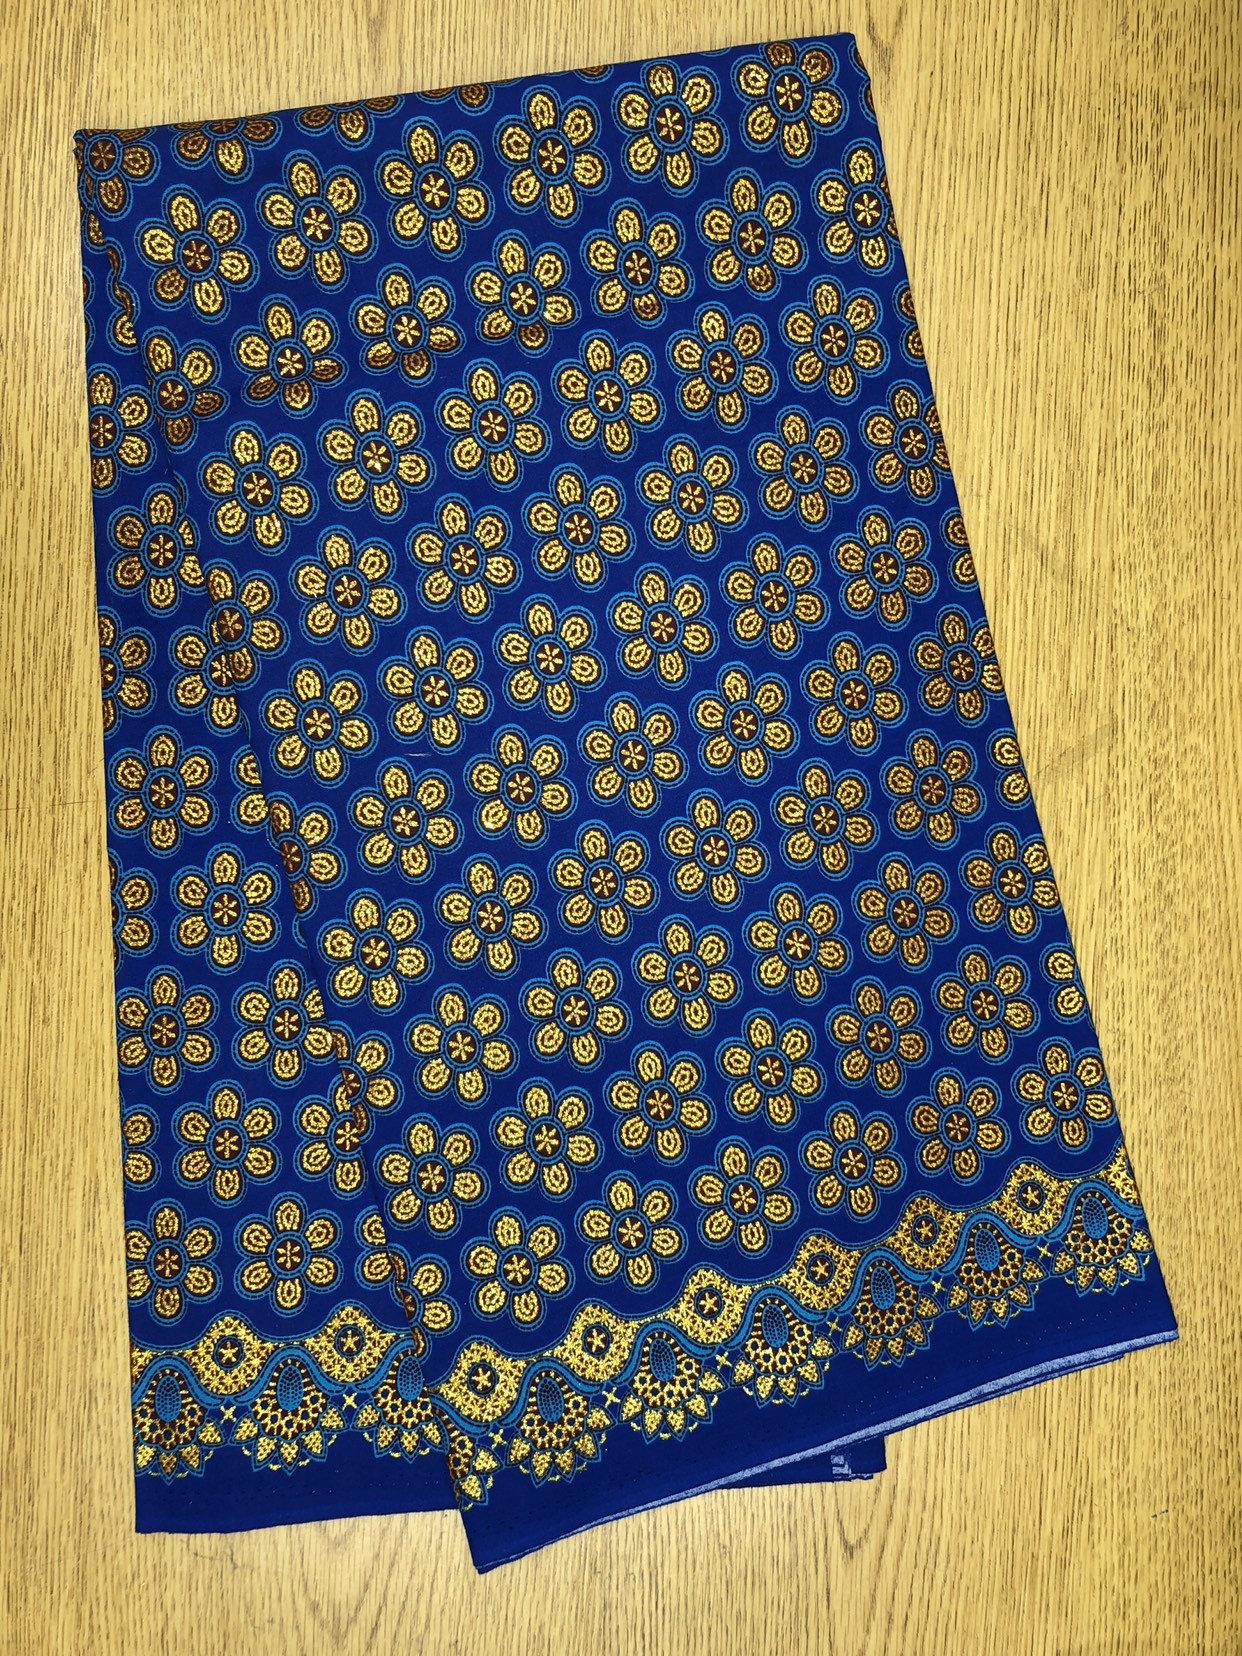 Per Yard Blue Gold Black Sun Flower Ankara African Print Fabric 1